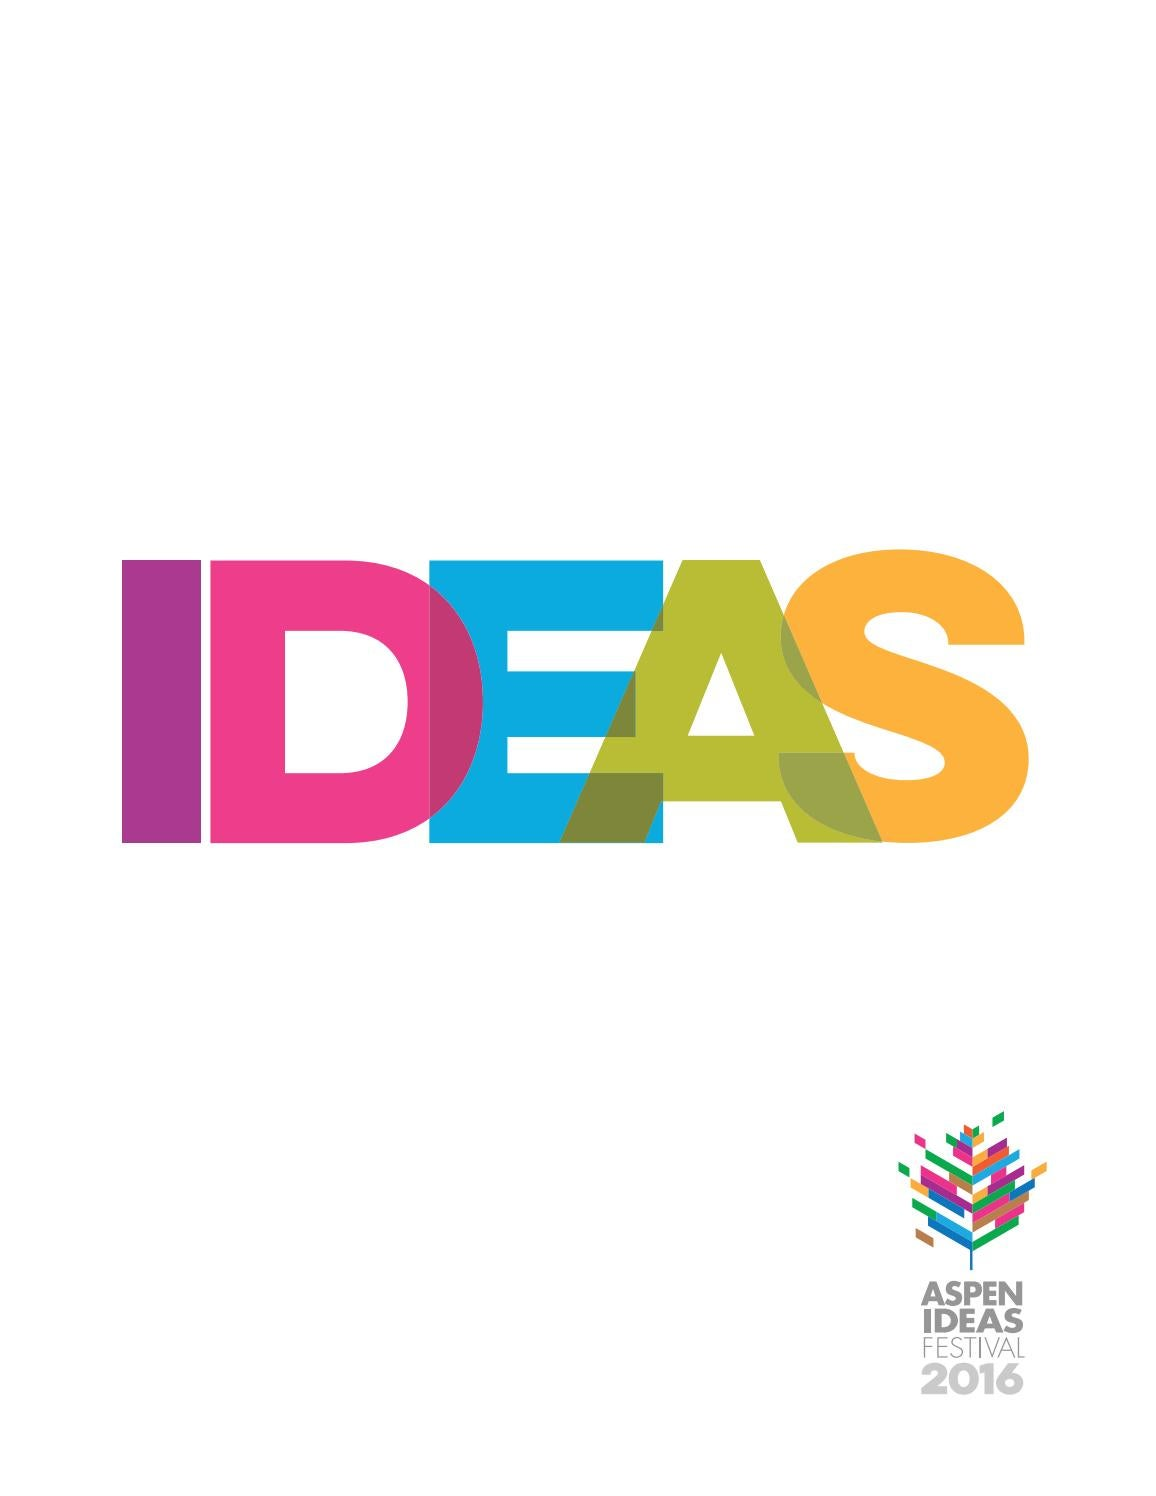 Aspen Ideas Festival 2020.Aspen Ideas Festival 2016 Program By Kissane Viola Design